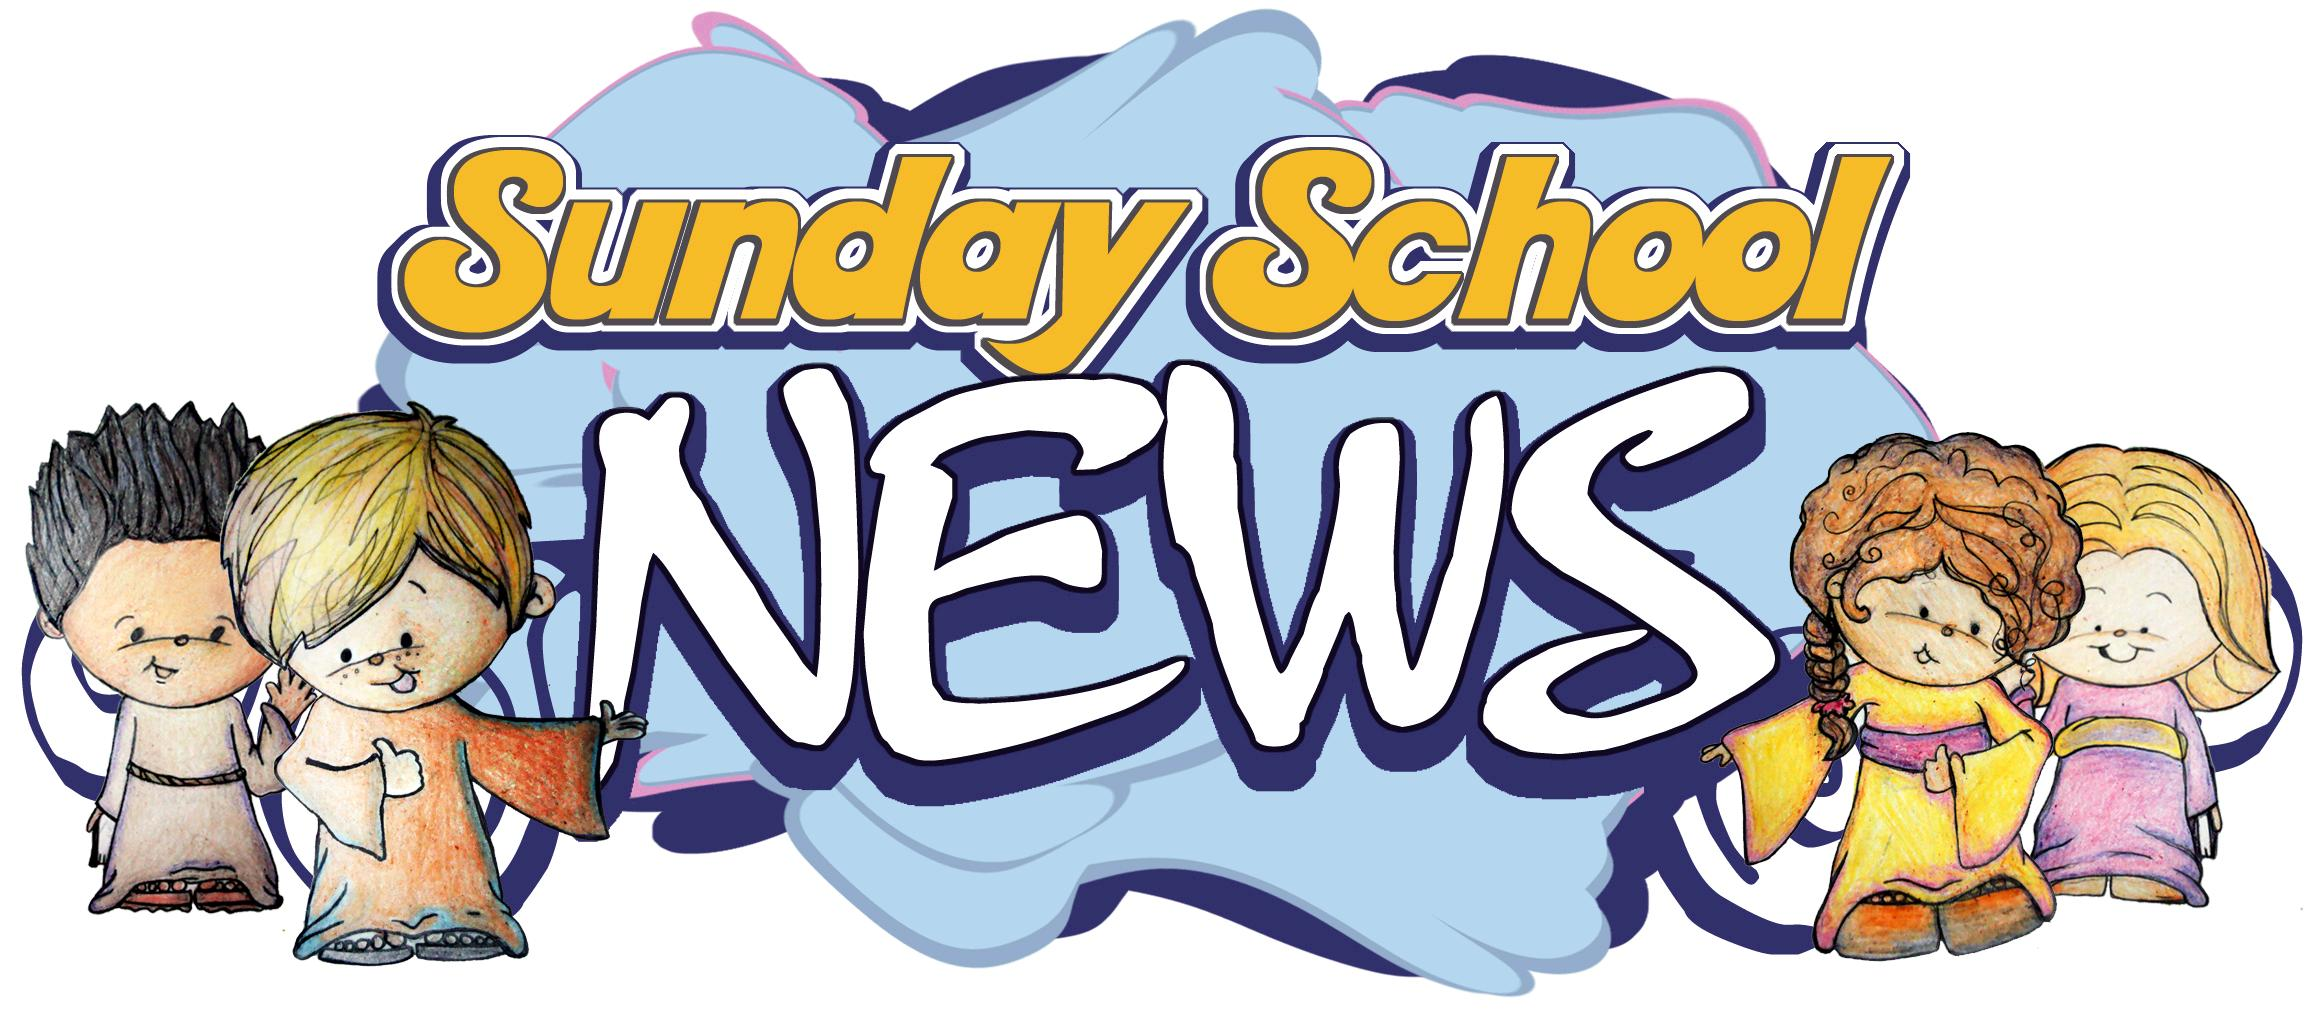 Sunday School Clip Art Free Clipart Best-Sunday School Clip Art Free Clipart Best-9